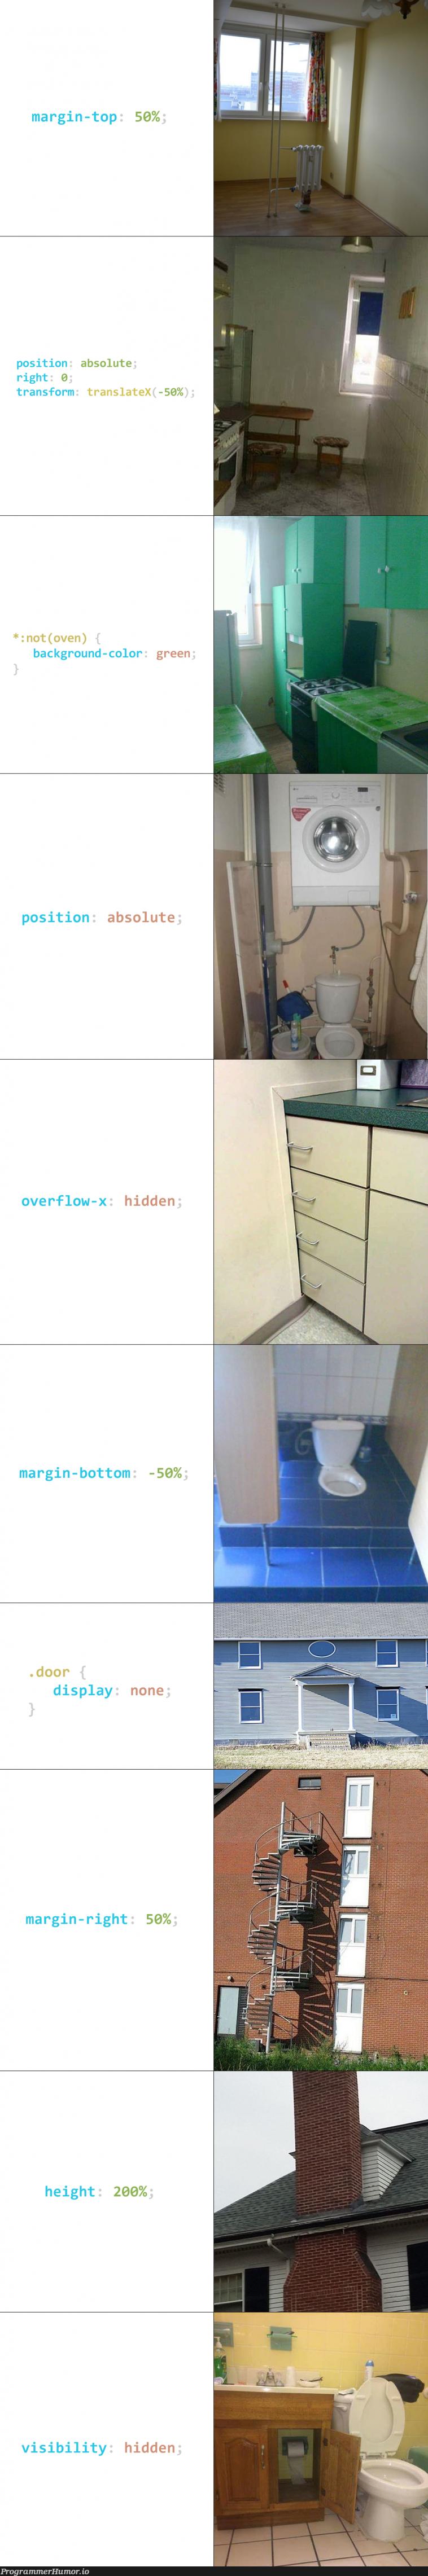 When bad frontends renovate houses | frontend-memes, overflow-memes, bot-memes | ProgrammerHumor.io